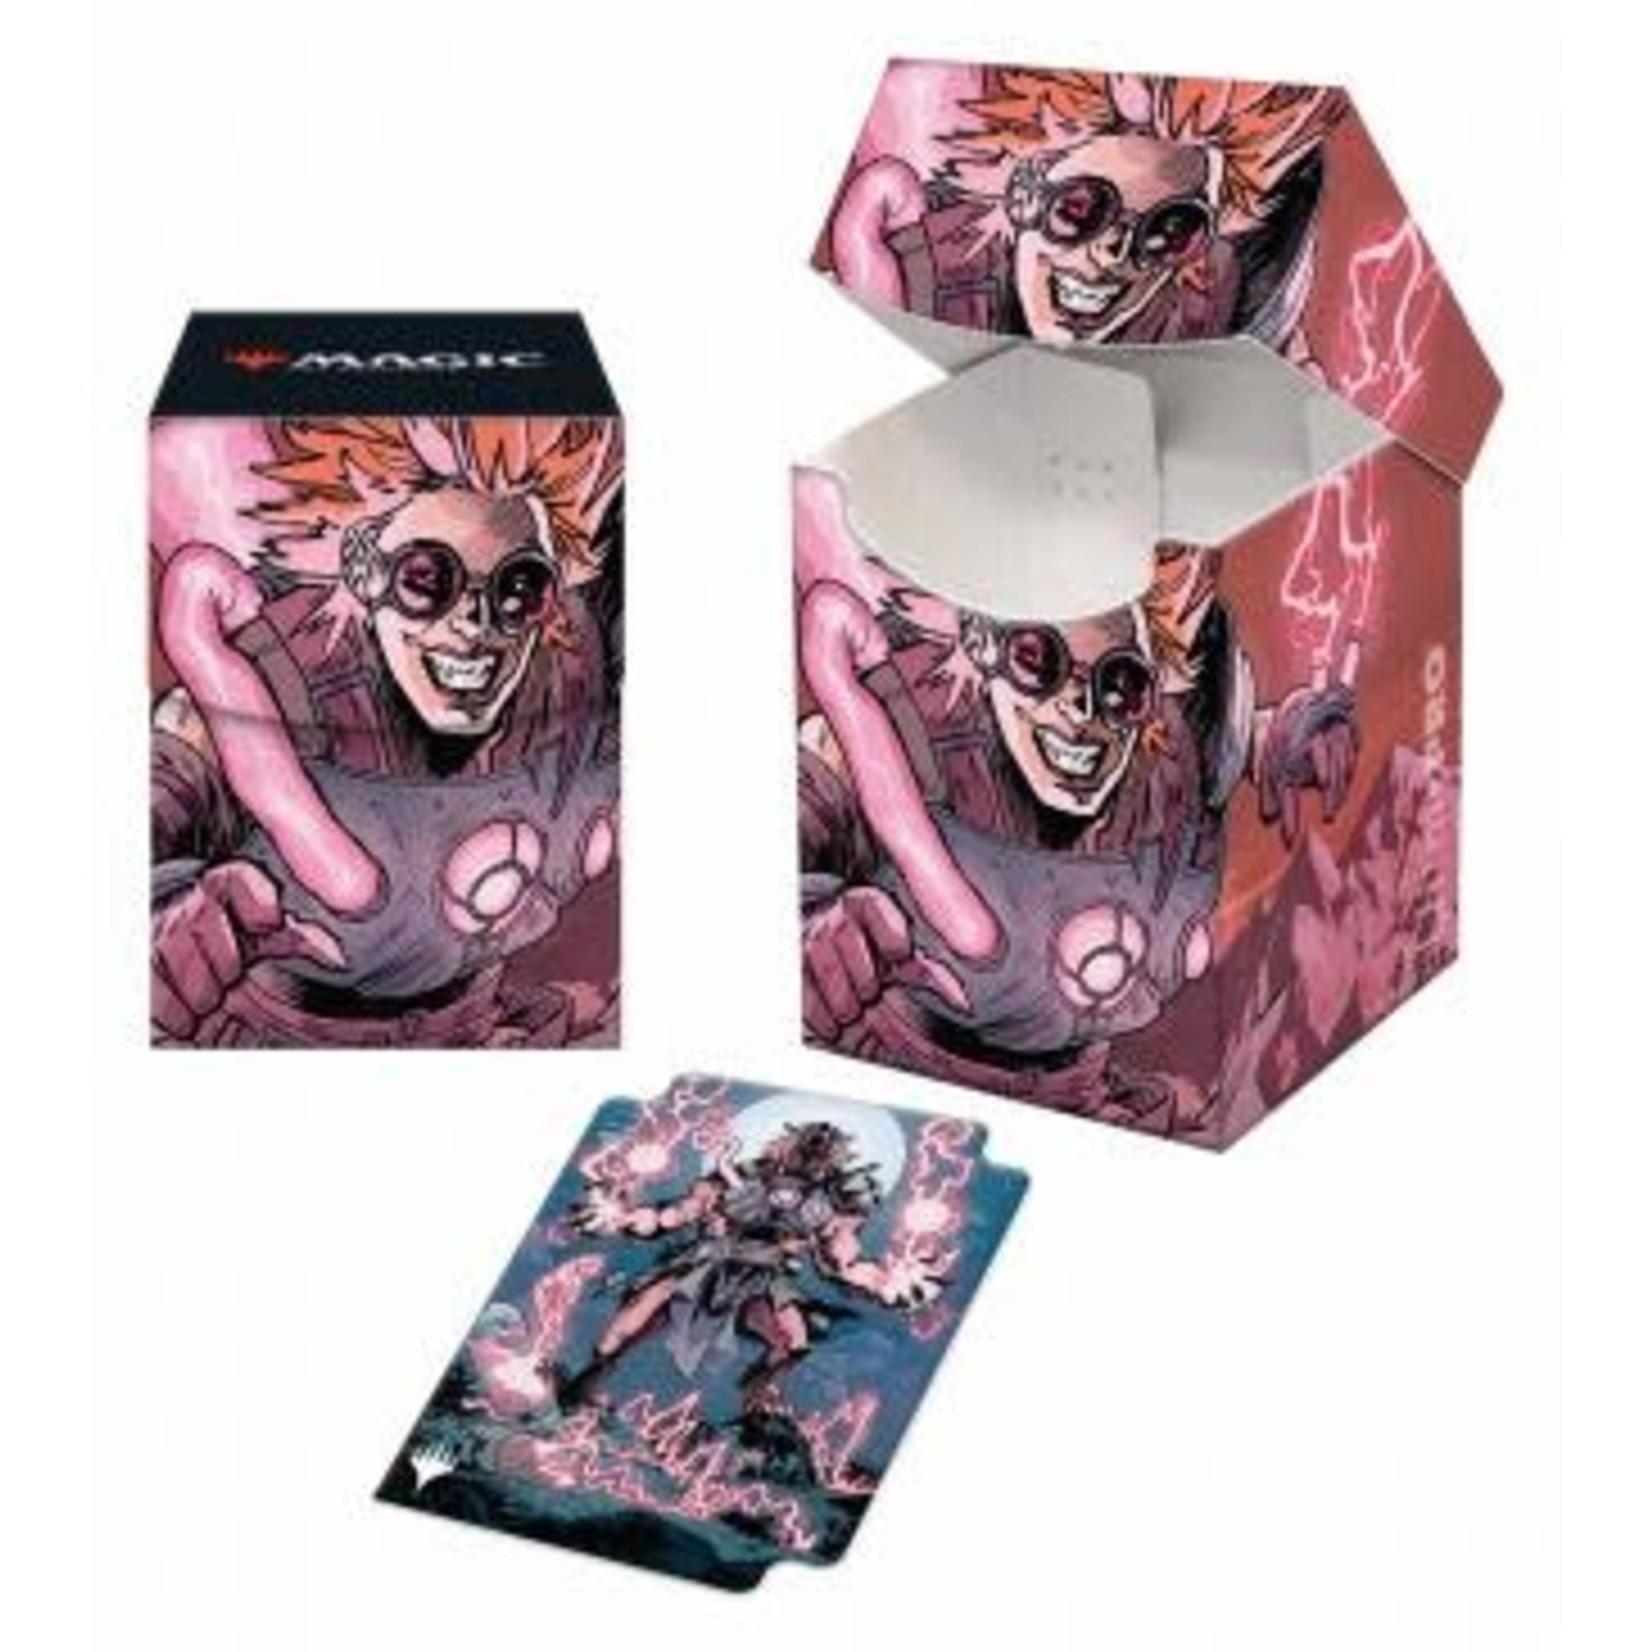 Ultra Pro Magic: The Gathering - Innistrad: Midnight Hunt Deck Box V4 featuring Reckless Stormseeker (100)